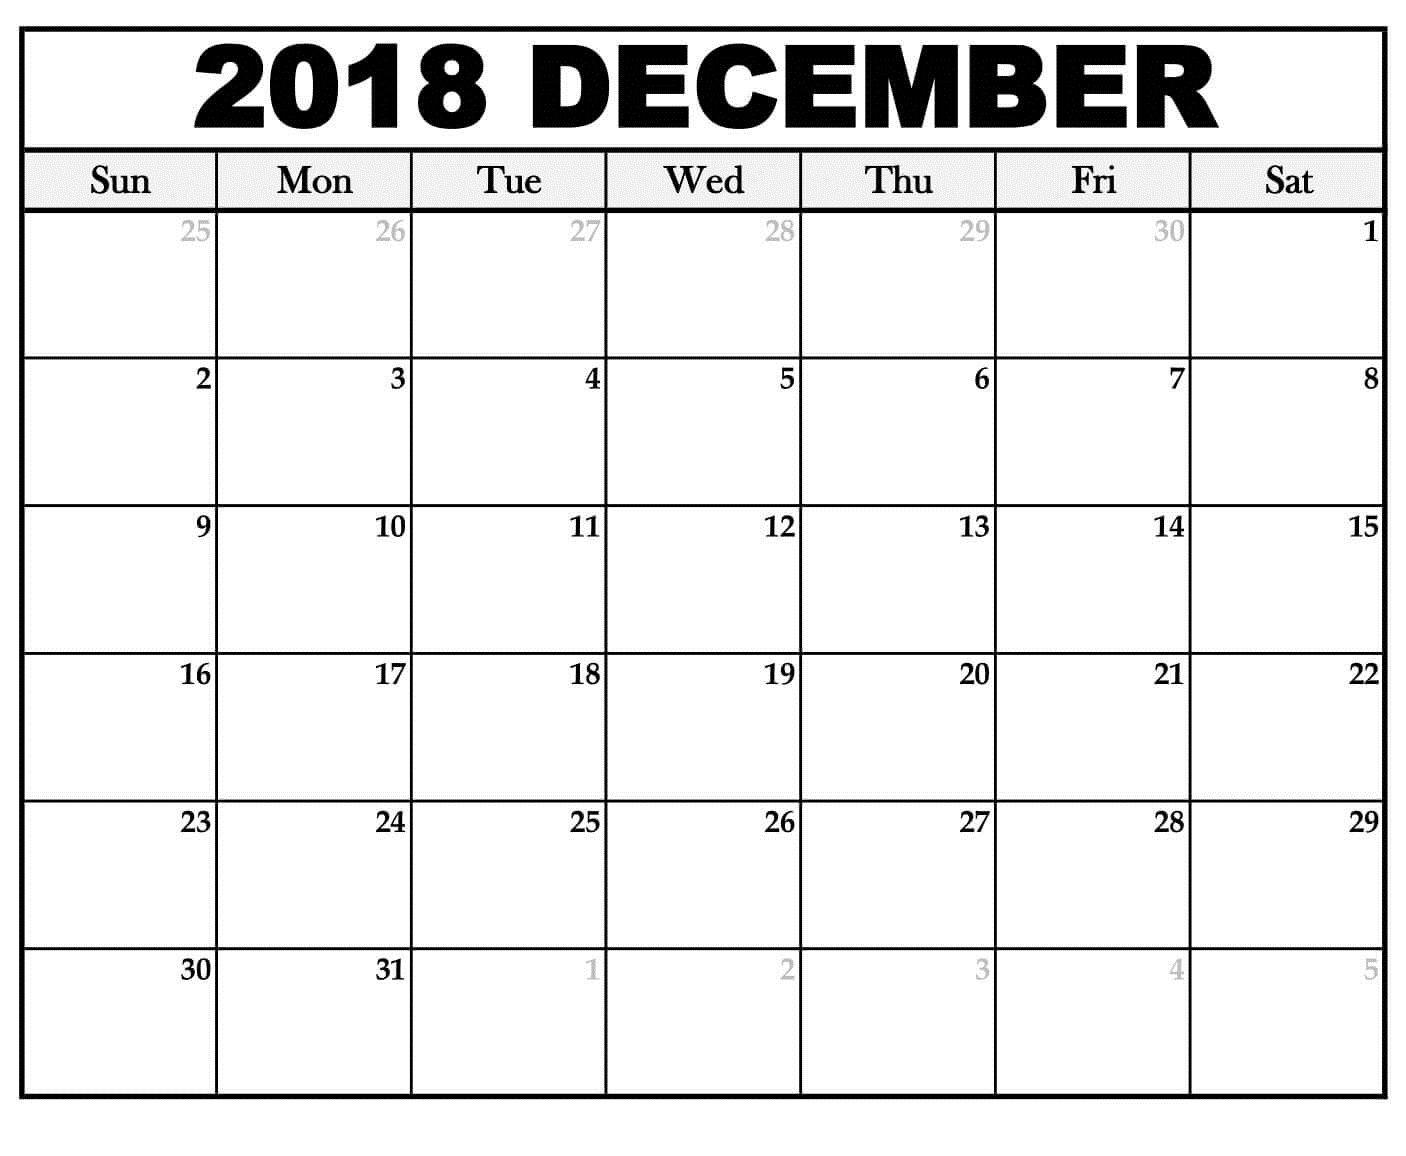 Calendar December 2018 Editable Template | Printable Calendar throughout Blank Writable Calendar Template Large December Calendar Com